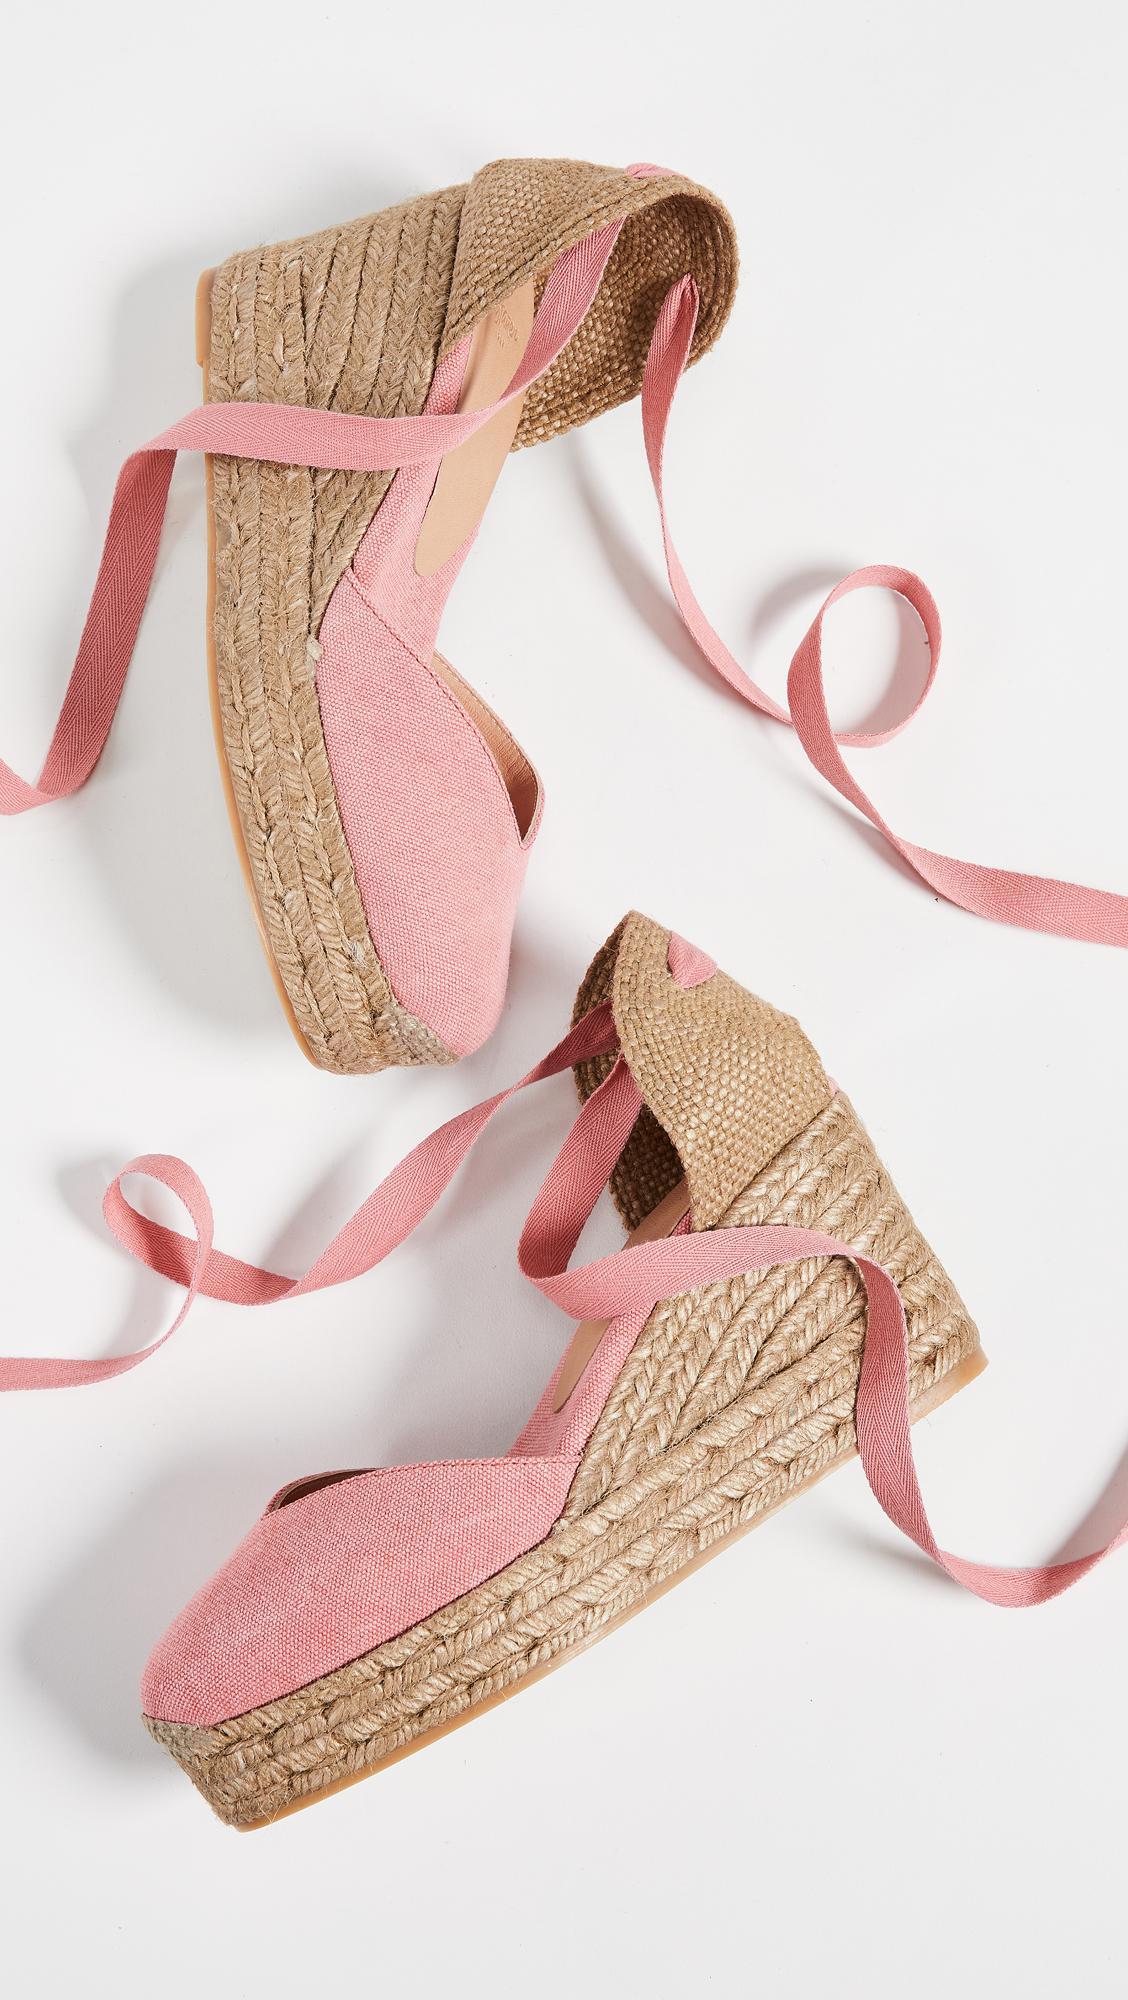 557b043fc0e Castaner Chiara T Wedge Espadrilles in Pink - Lyst